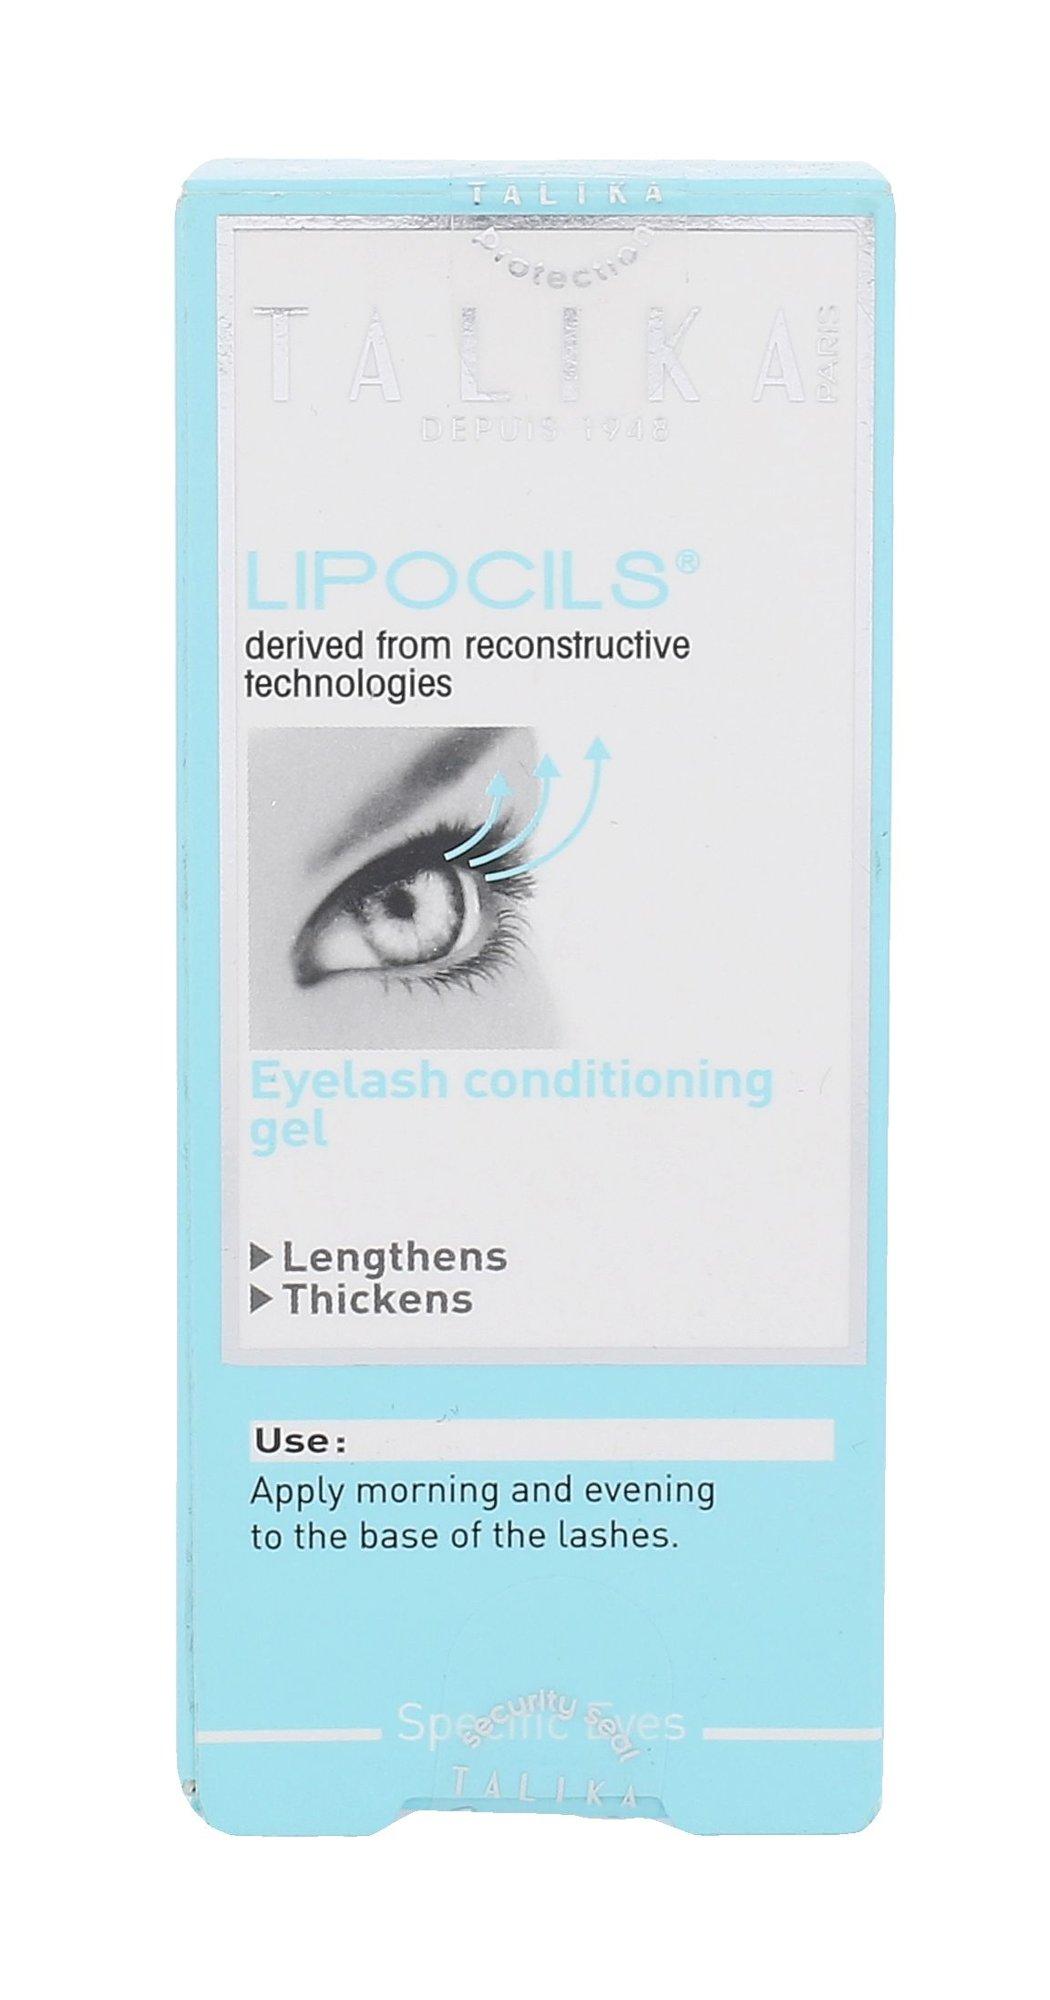 Talika Lipocils Cosmetic 10ml  Eyelash Conditioning Gel